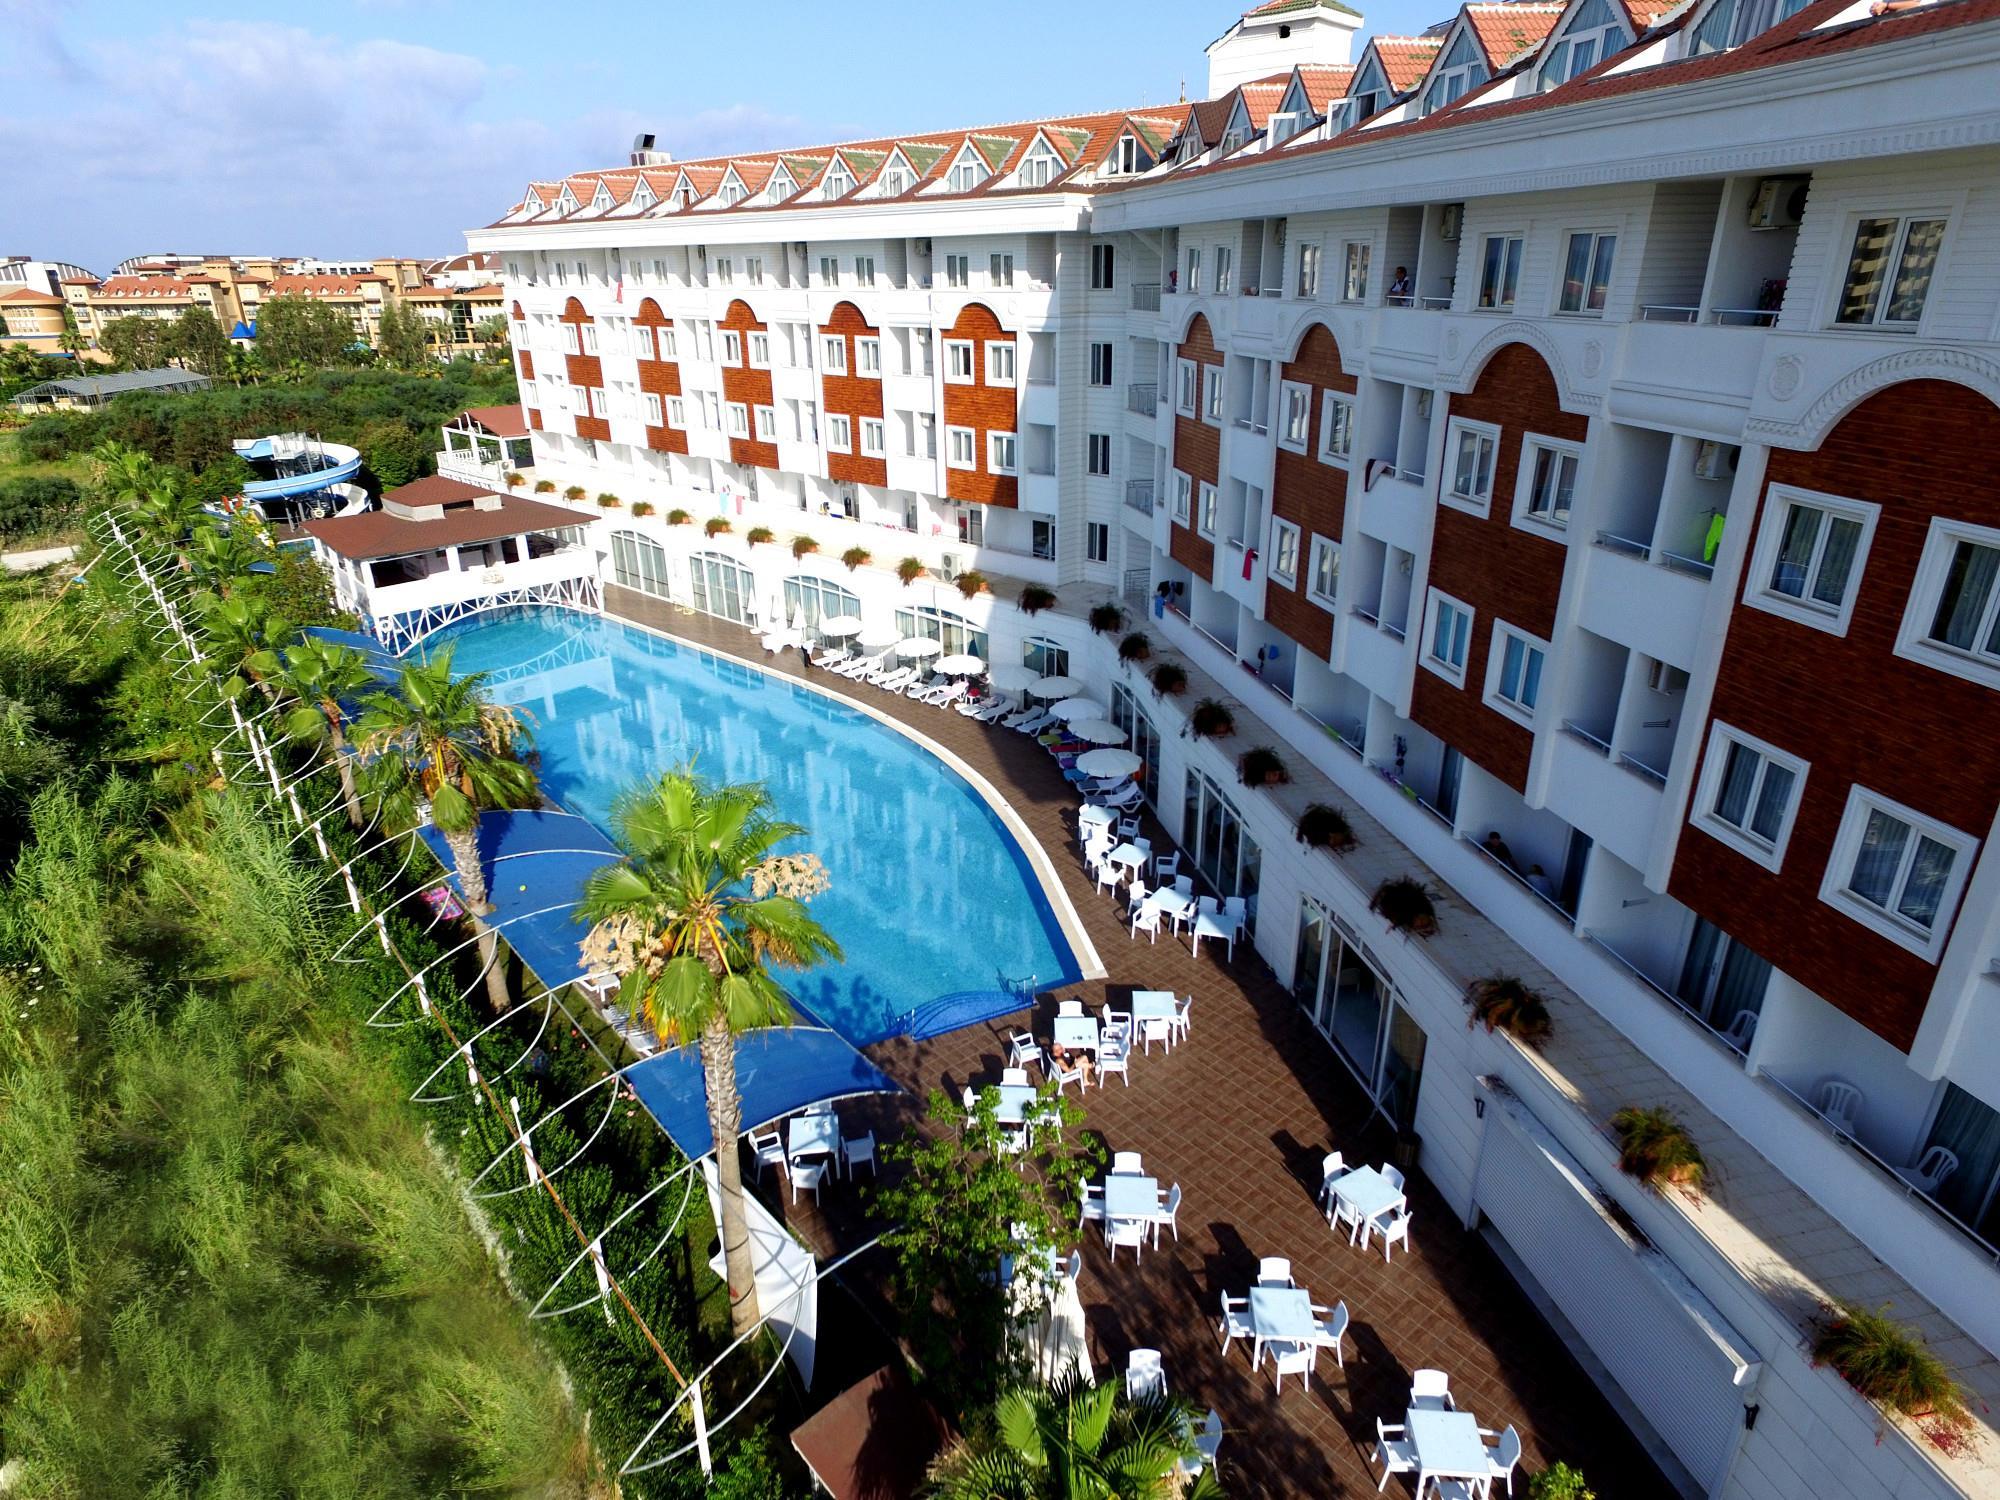 http://www.orextravel.sk/OREX/hotelphotos/side-royal-paradise-general-0021.jpg